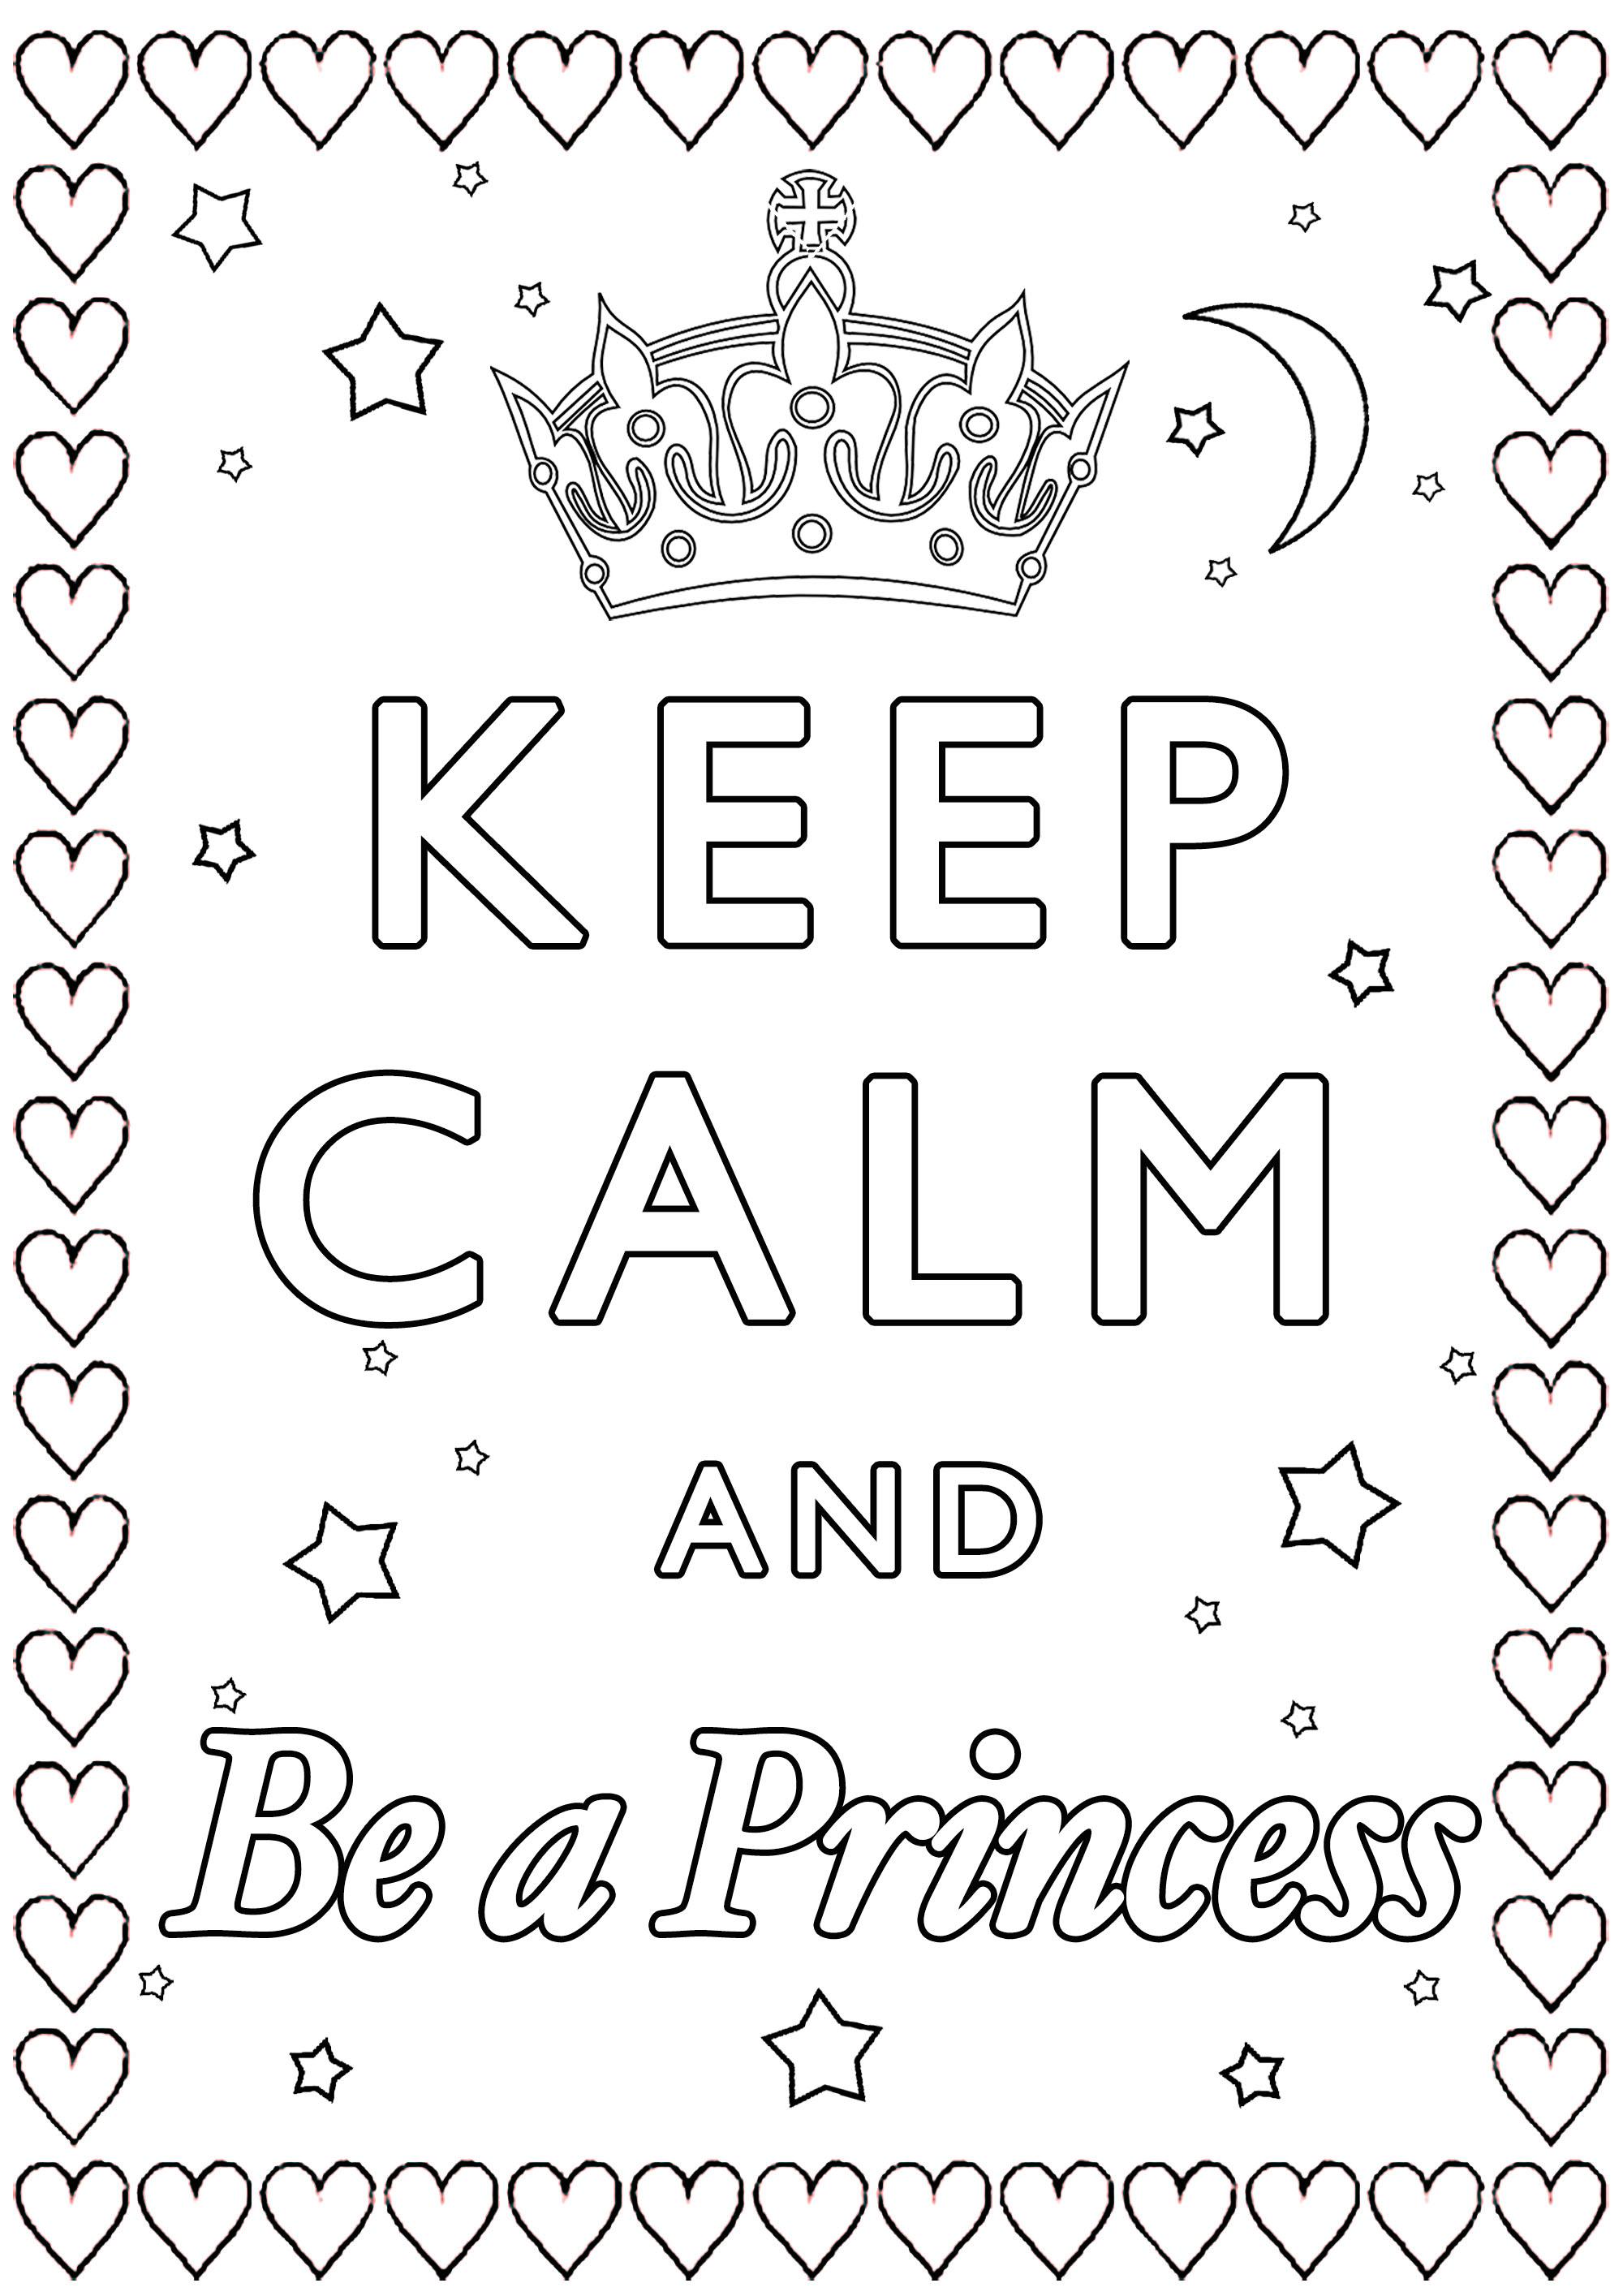 Disegni da Colorare per Adulti : Keep Calm - 3